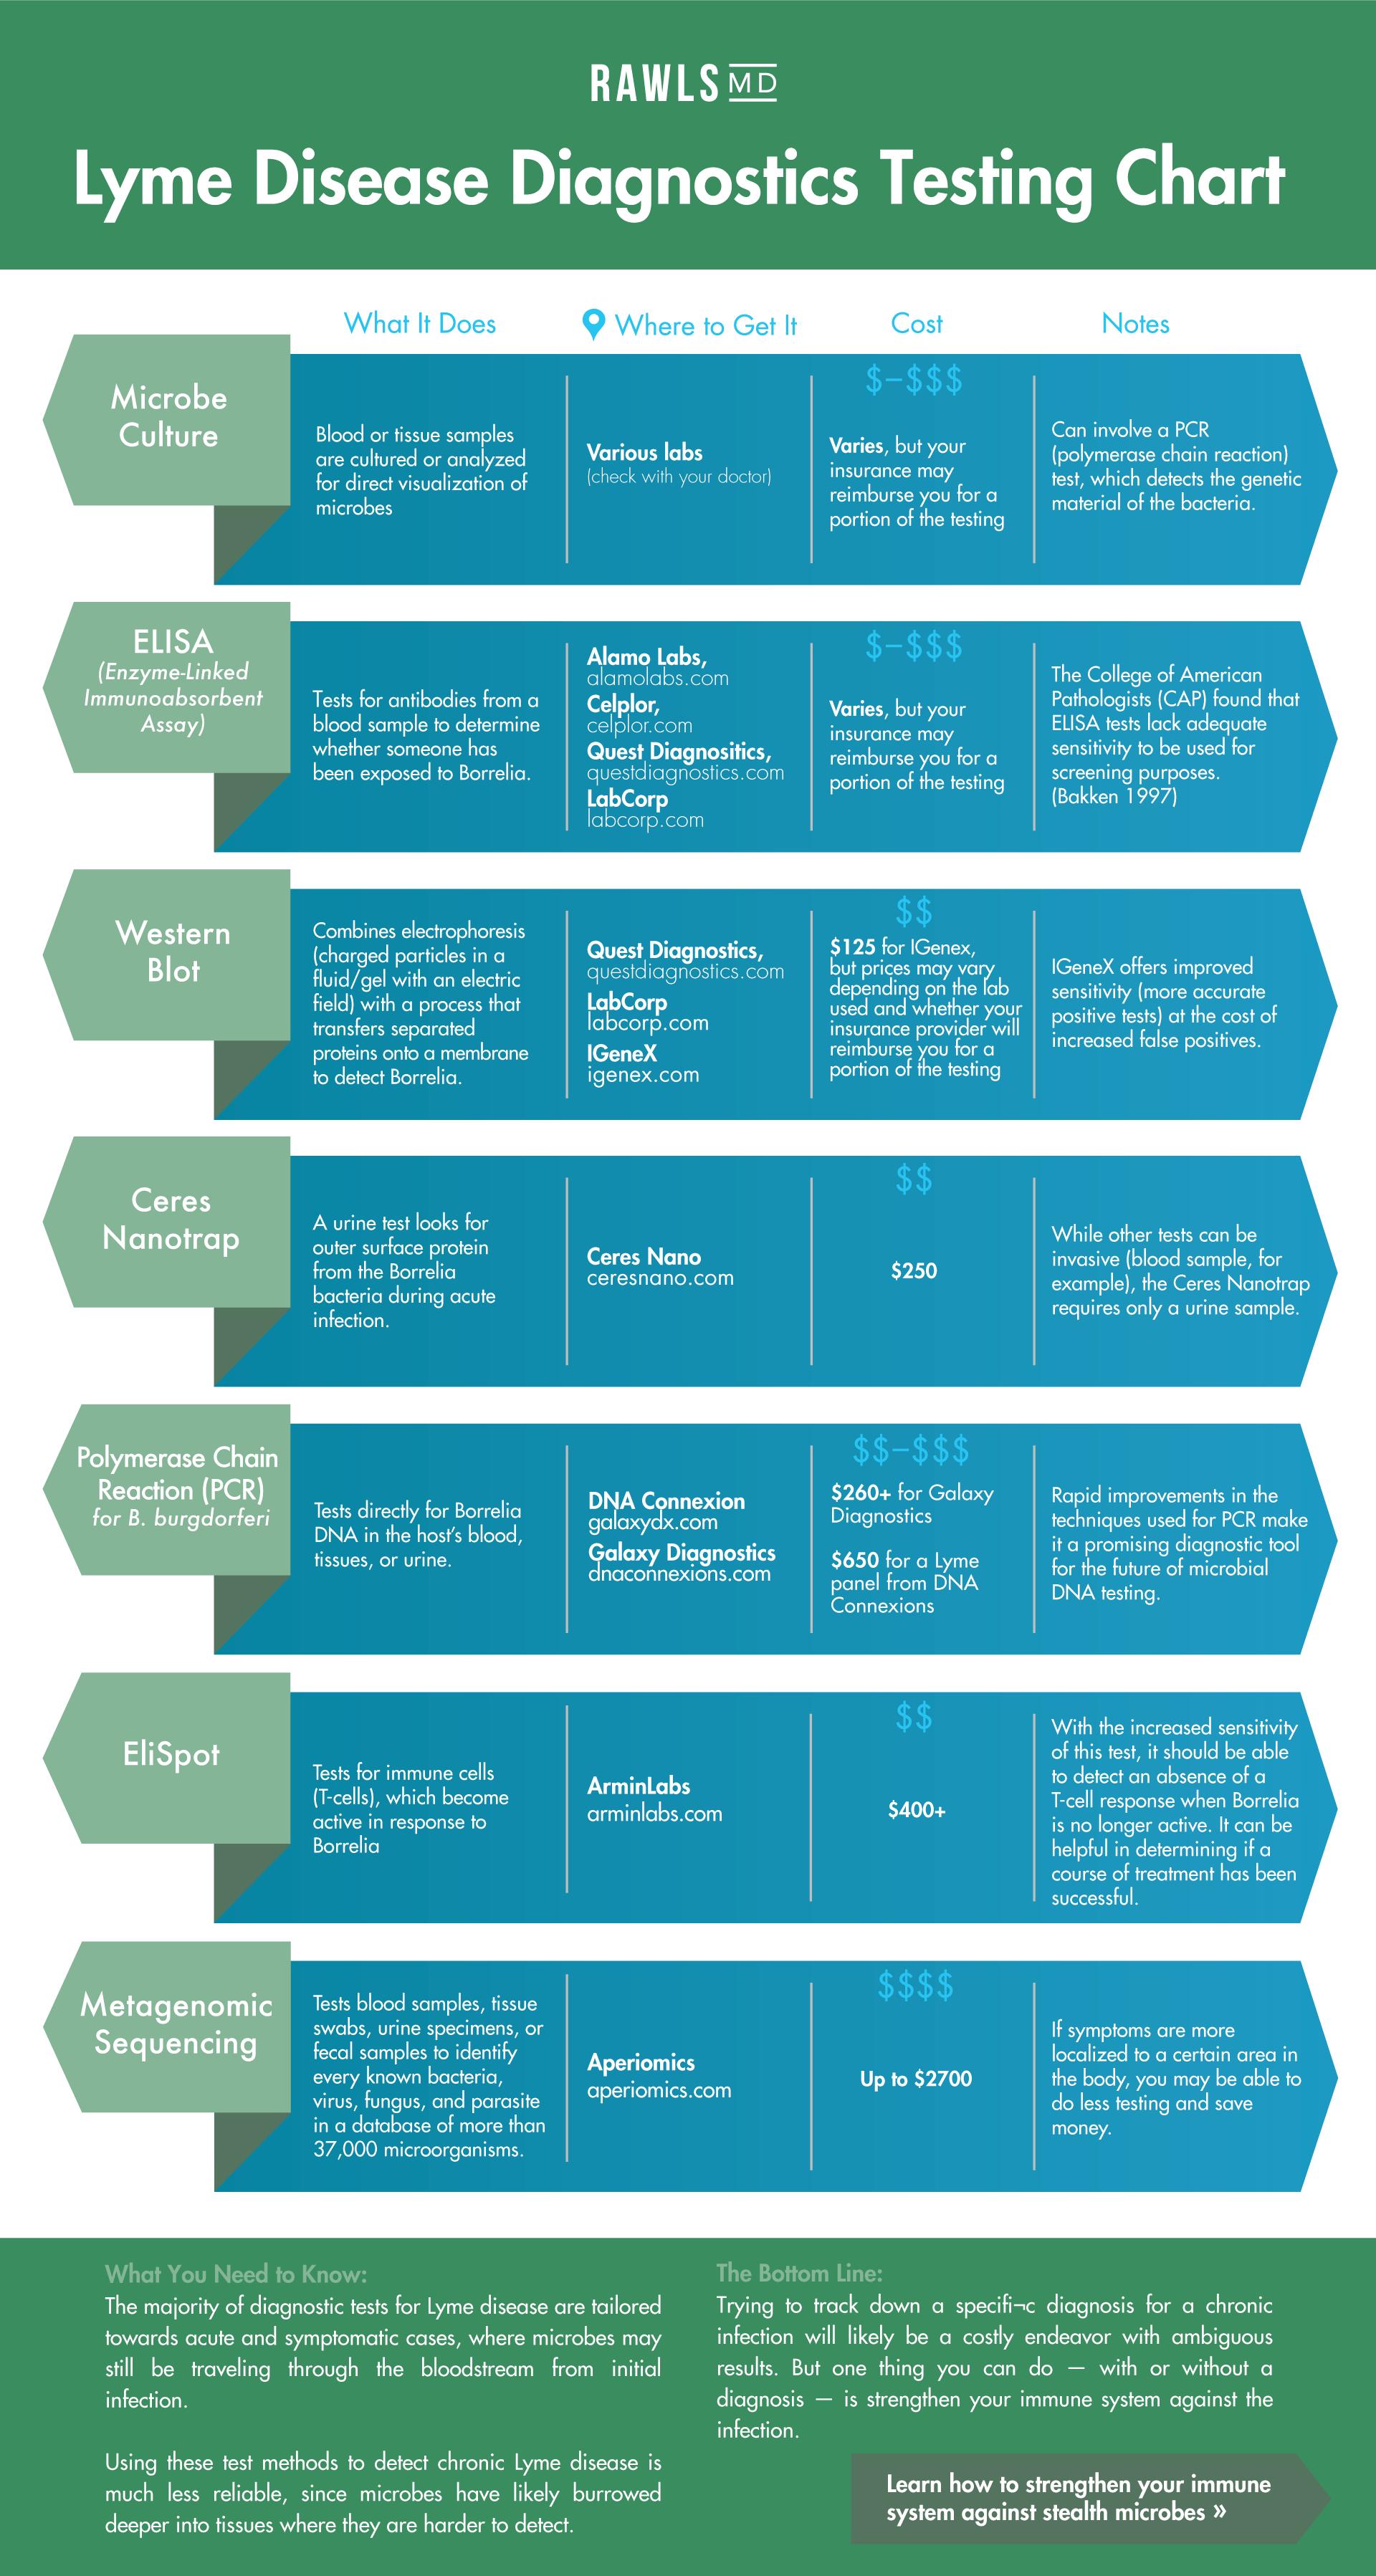 Lyme Disease Tests | Dr  Rawls' Complete Lyme Testing Guide | Lyme